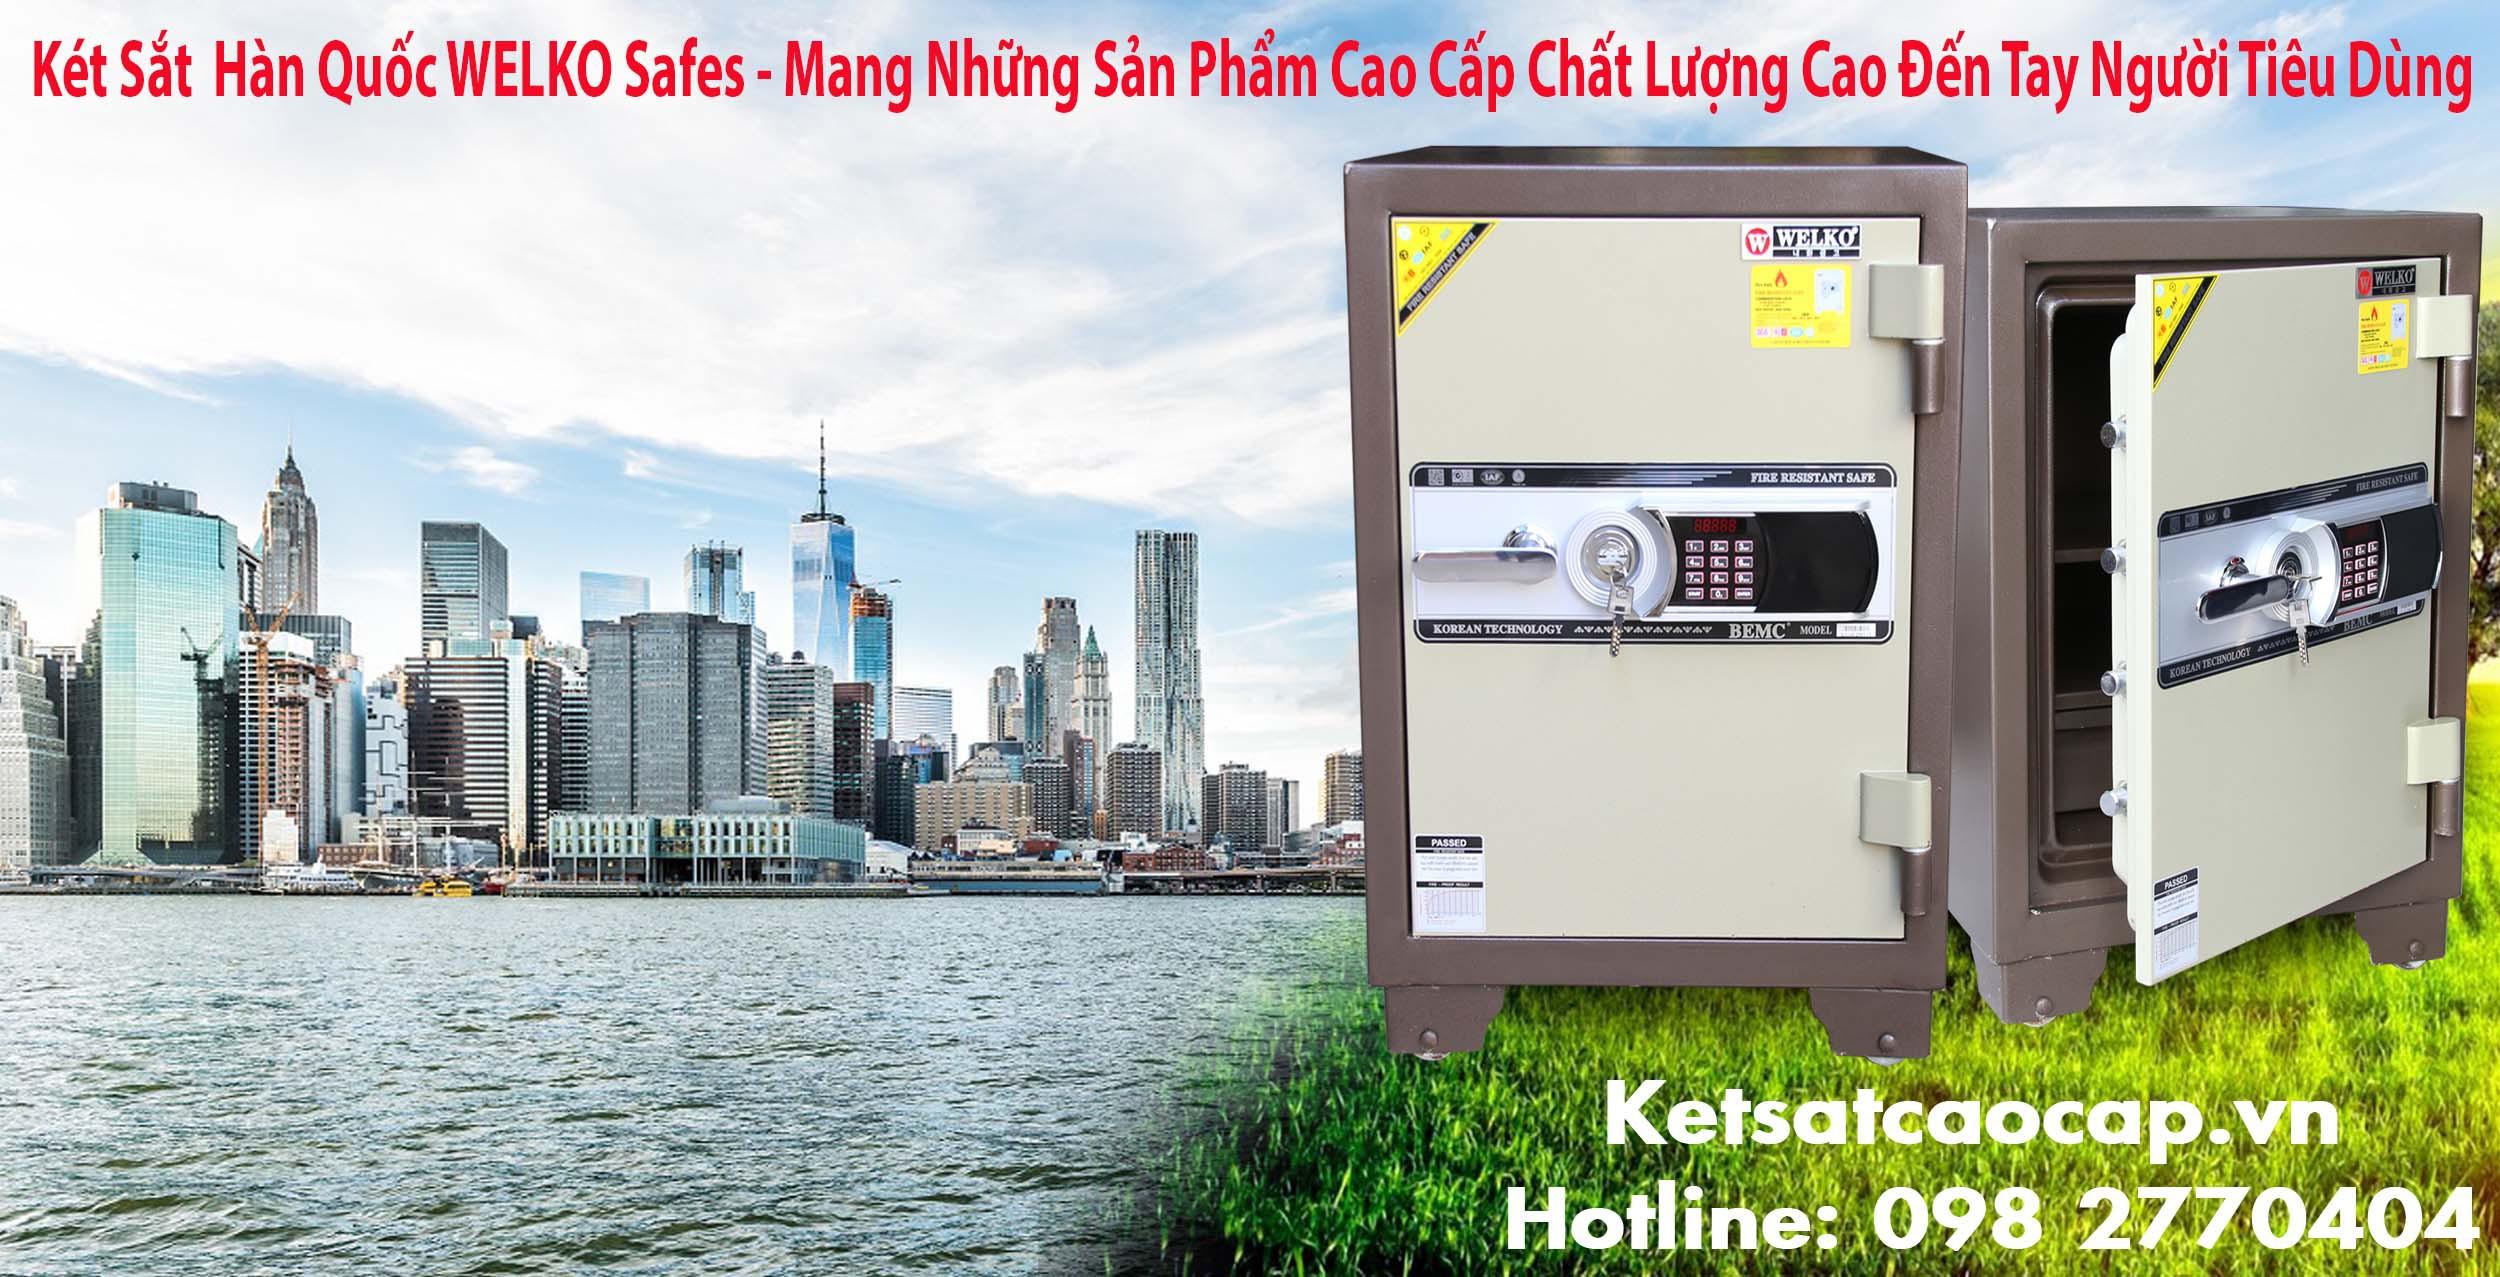 Ket-sat-han-quoc-chinh-hang